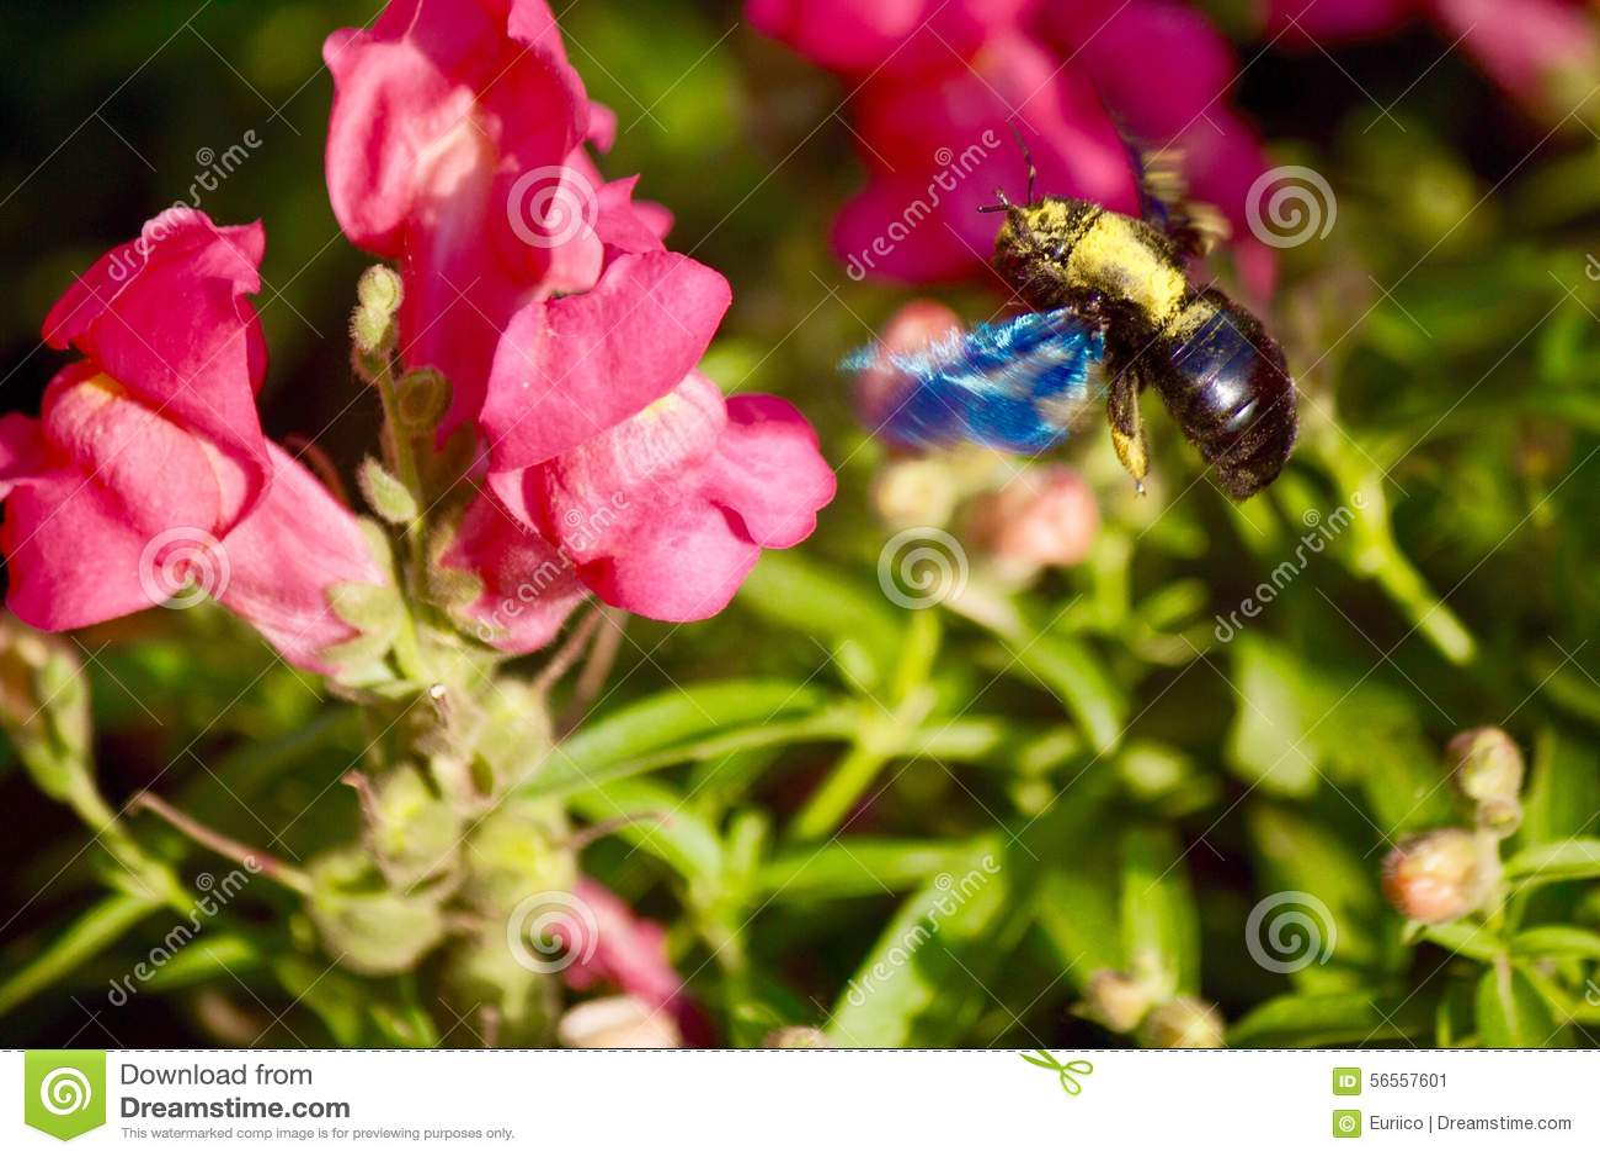 Download Τακτοποίηση μελισσών σε ένα λουλούδι Στοκ Εικόνα - εικόνα από μελισσών, νέκταρ: 56557601